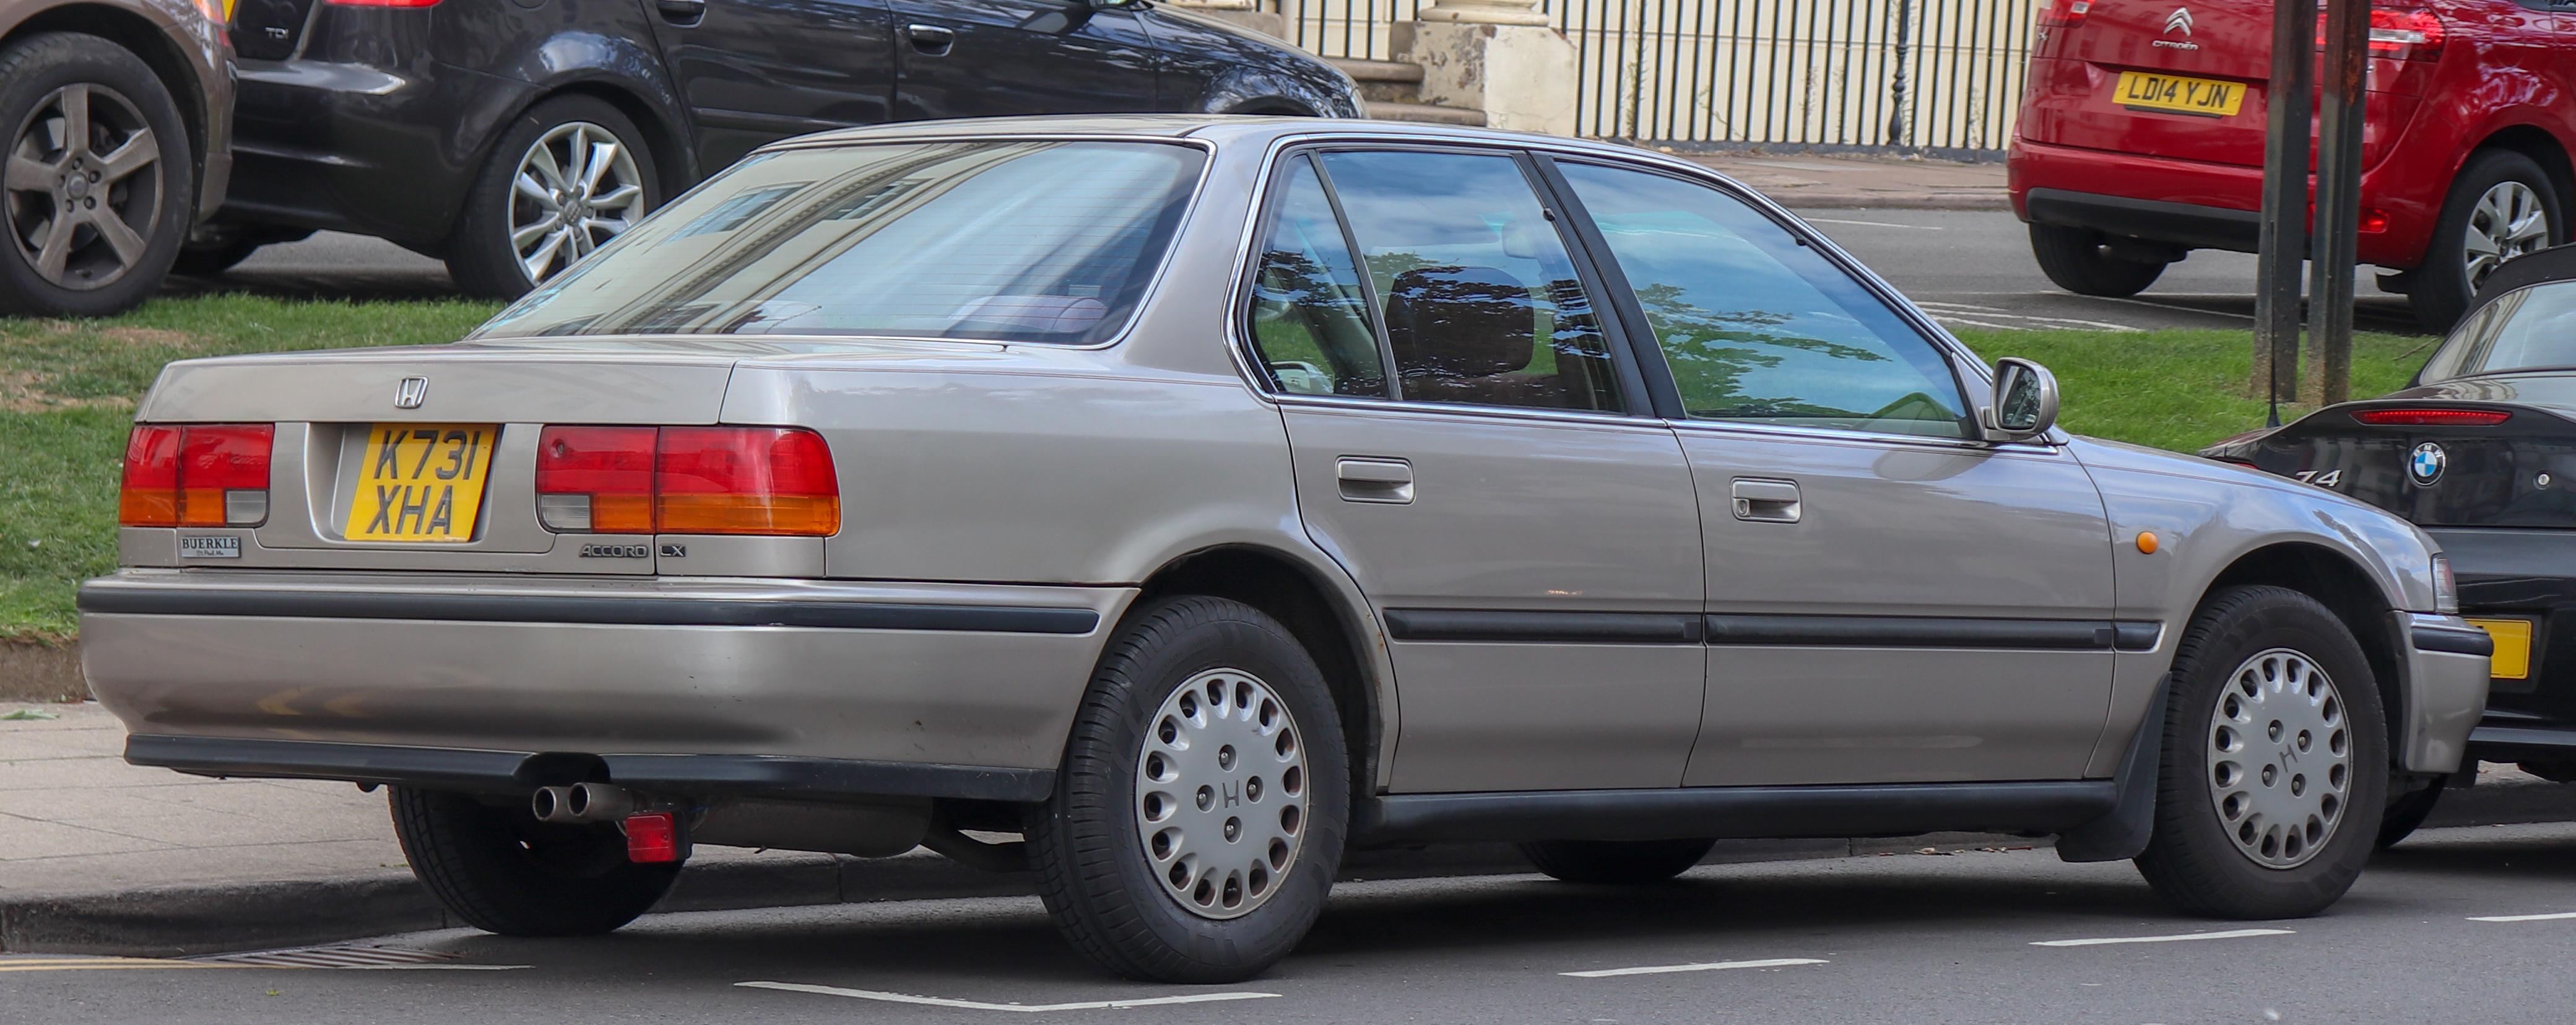 File:1993 Honda Accord 2.2 Rear.jpg - Wikimedia Commons